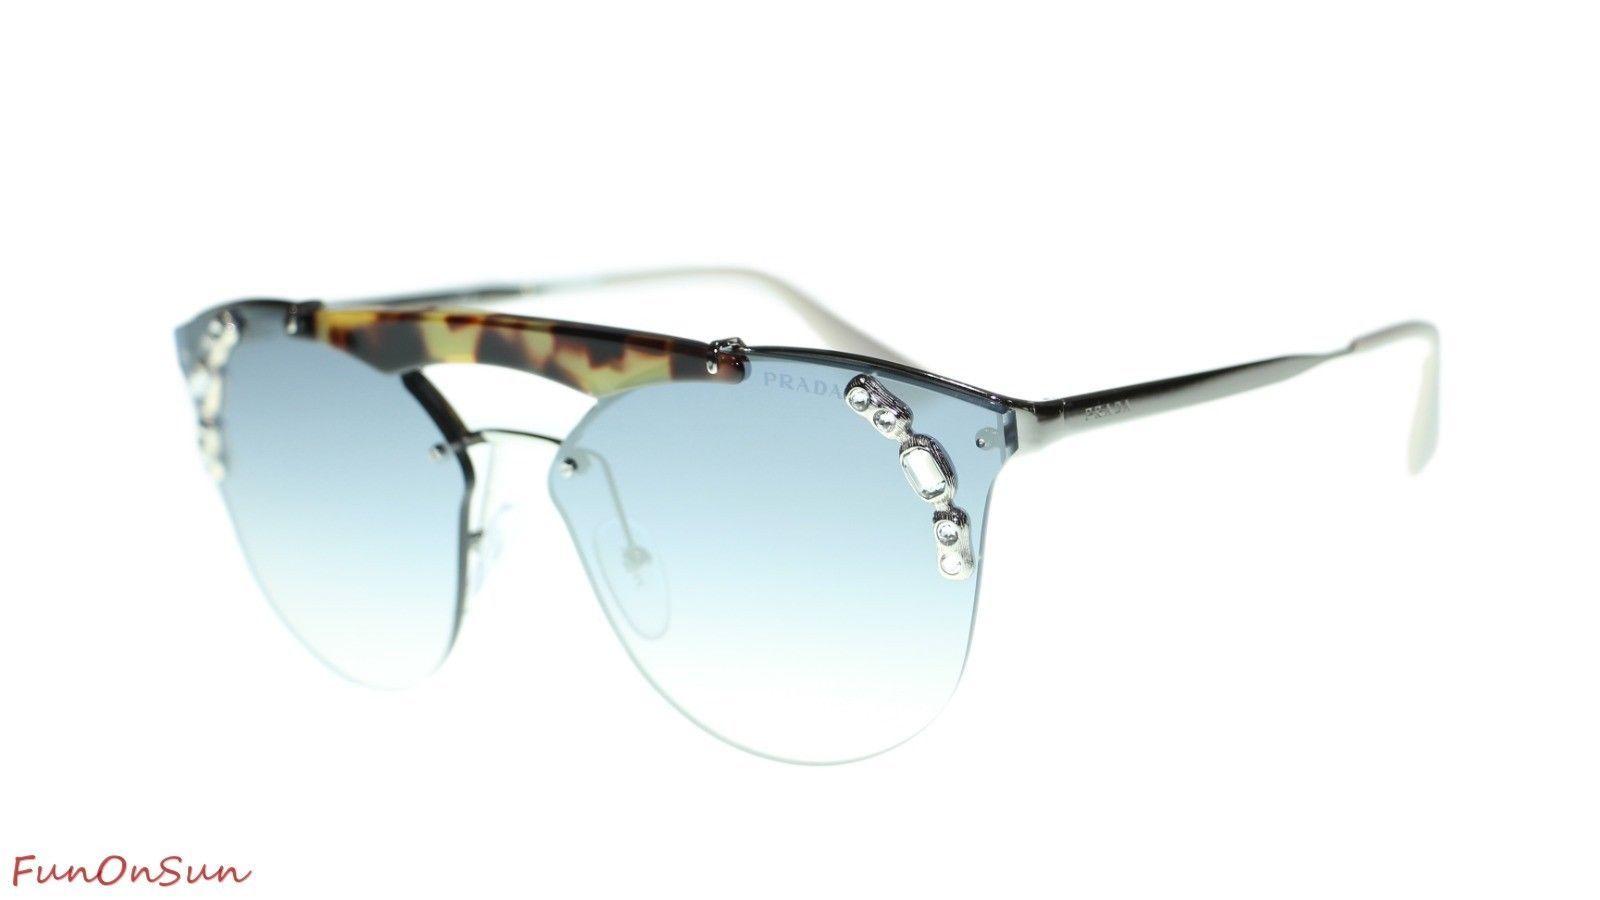 Prada Sunglasses PR53US 23C5R0 Silver Havana/Light Blue Mirror Silver Lens